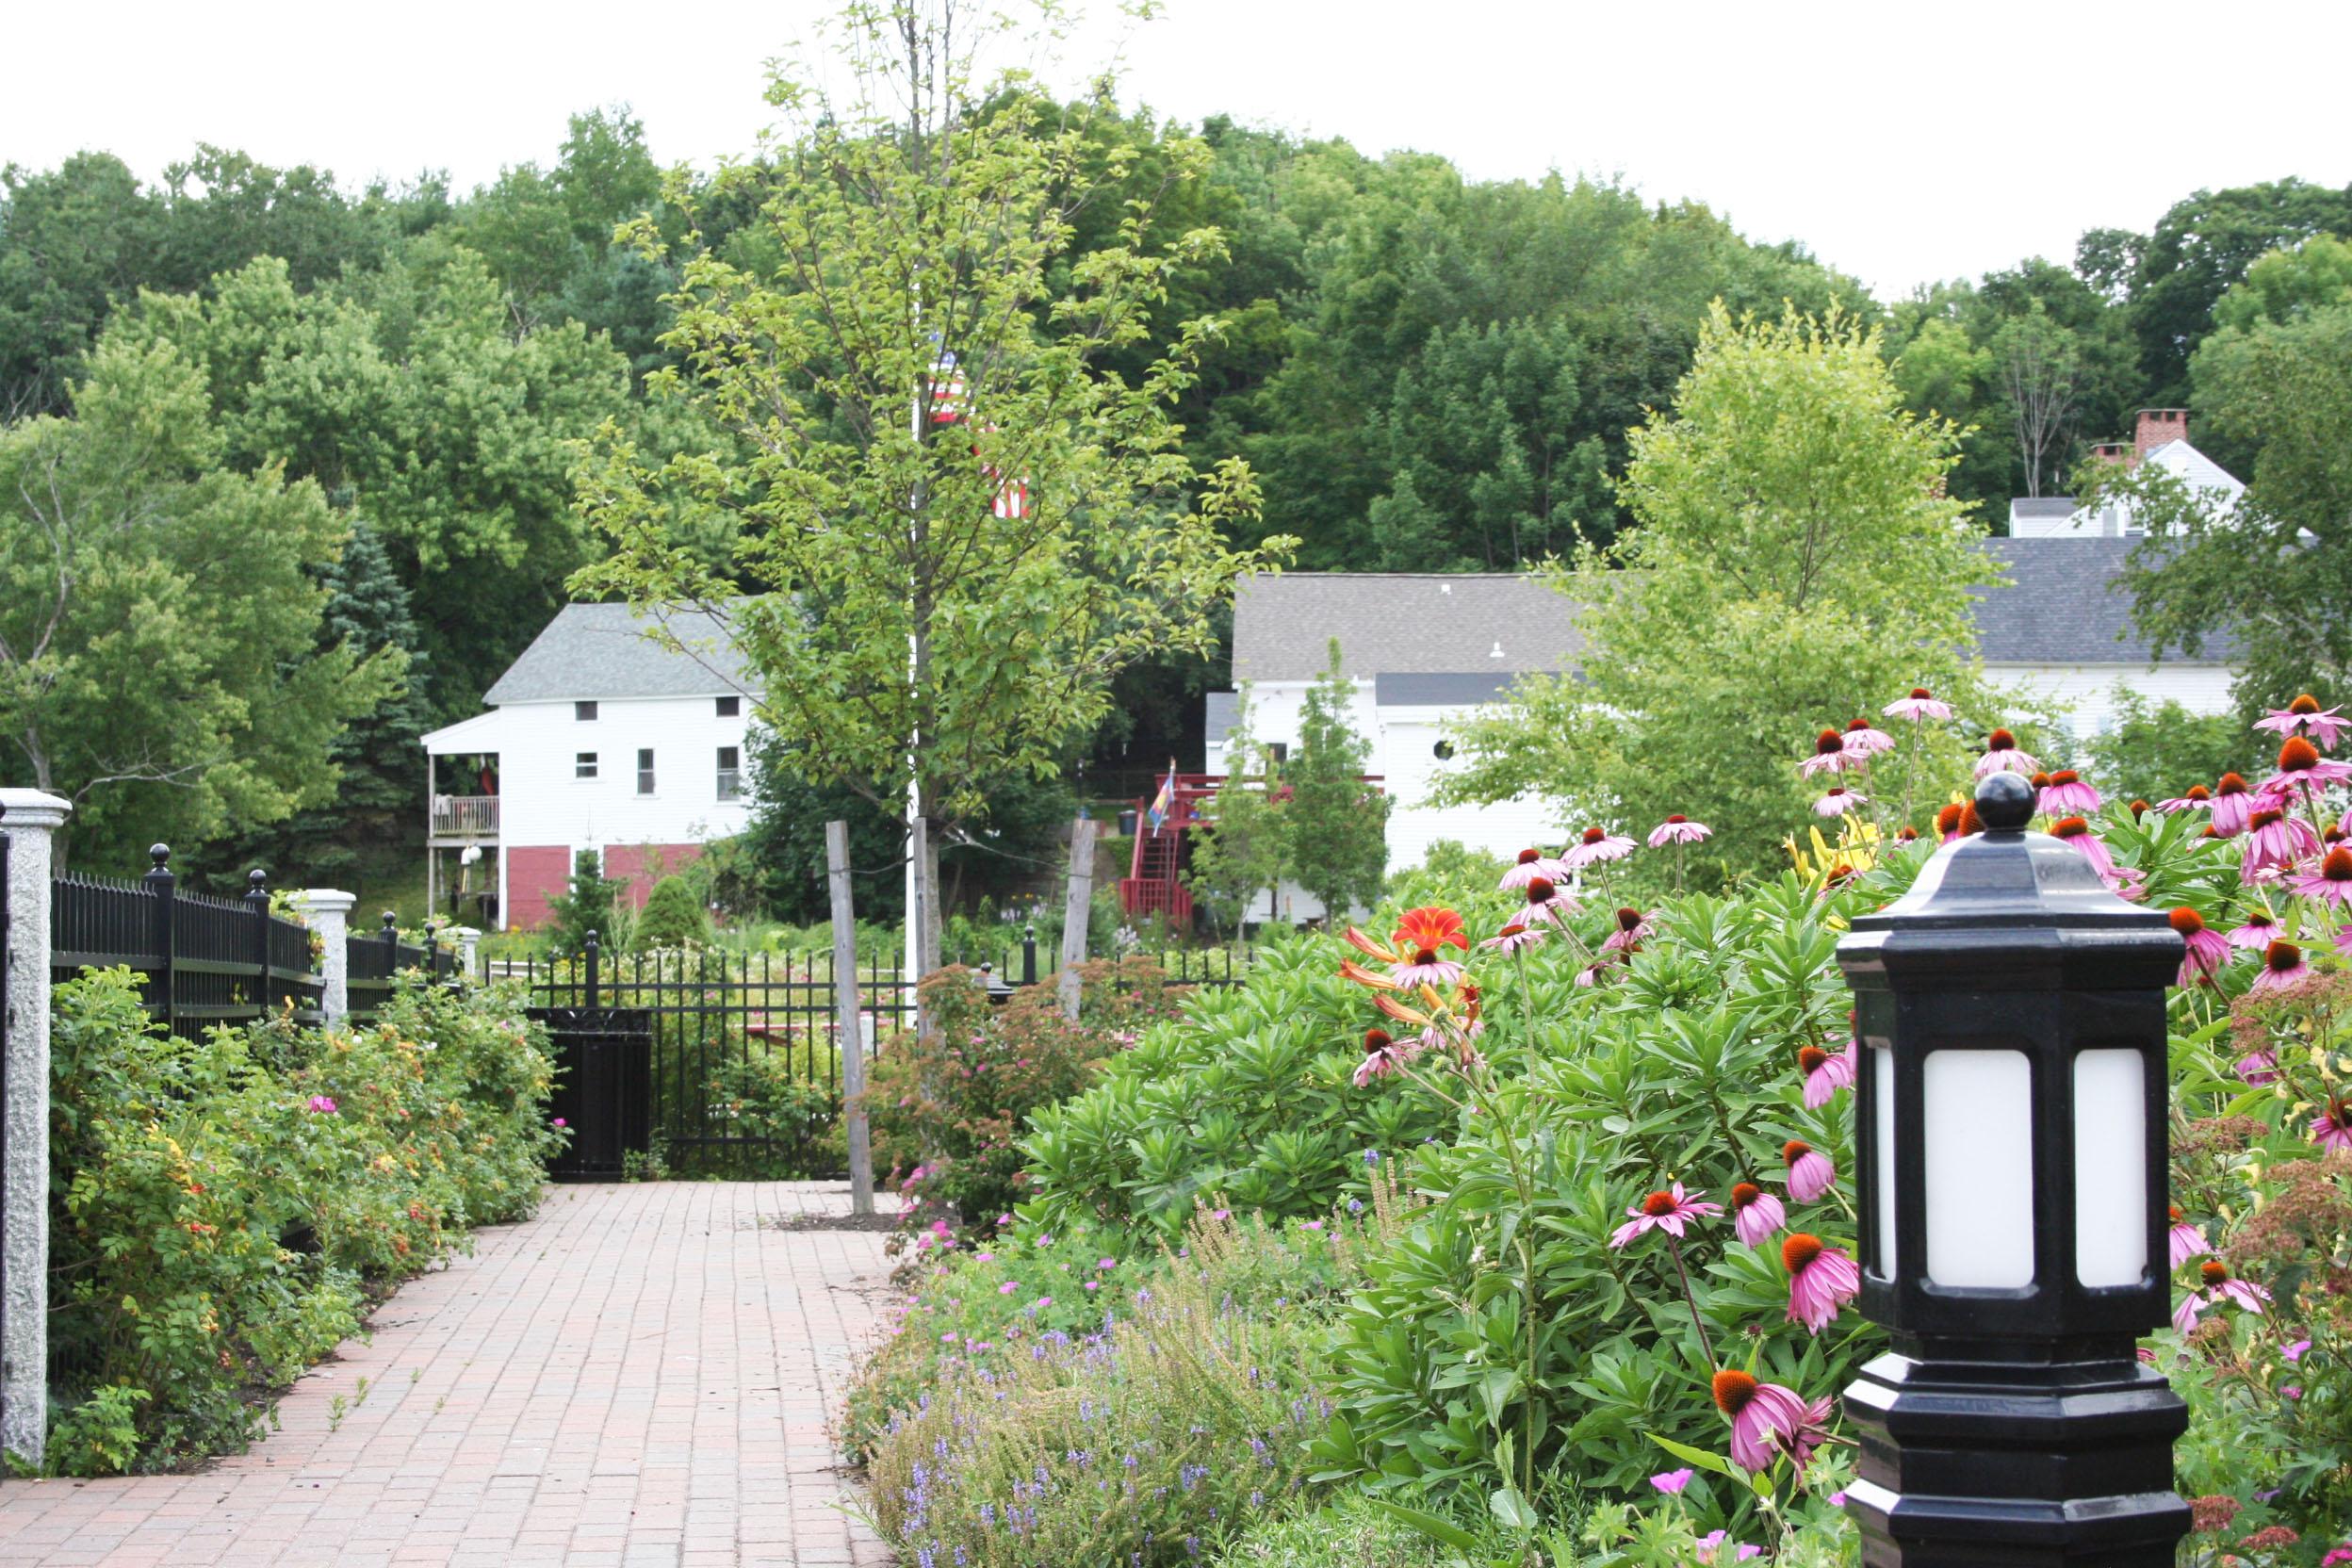 2009-08-06 site photos 031 improved.jpg